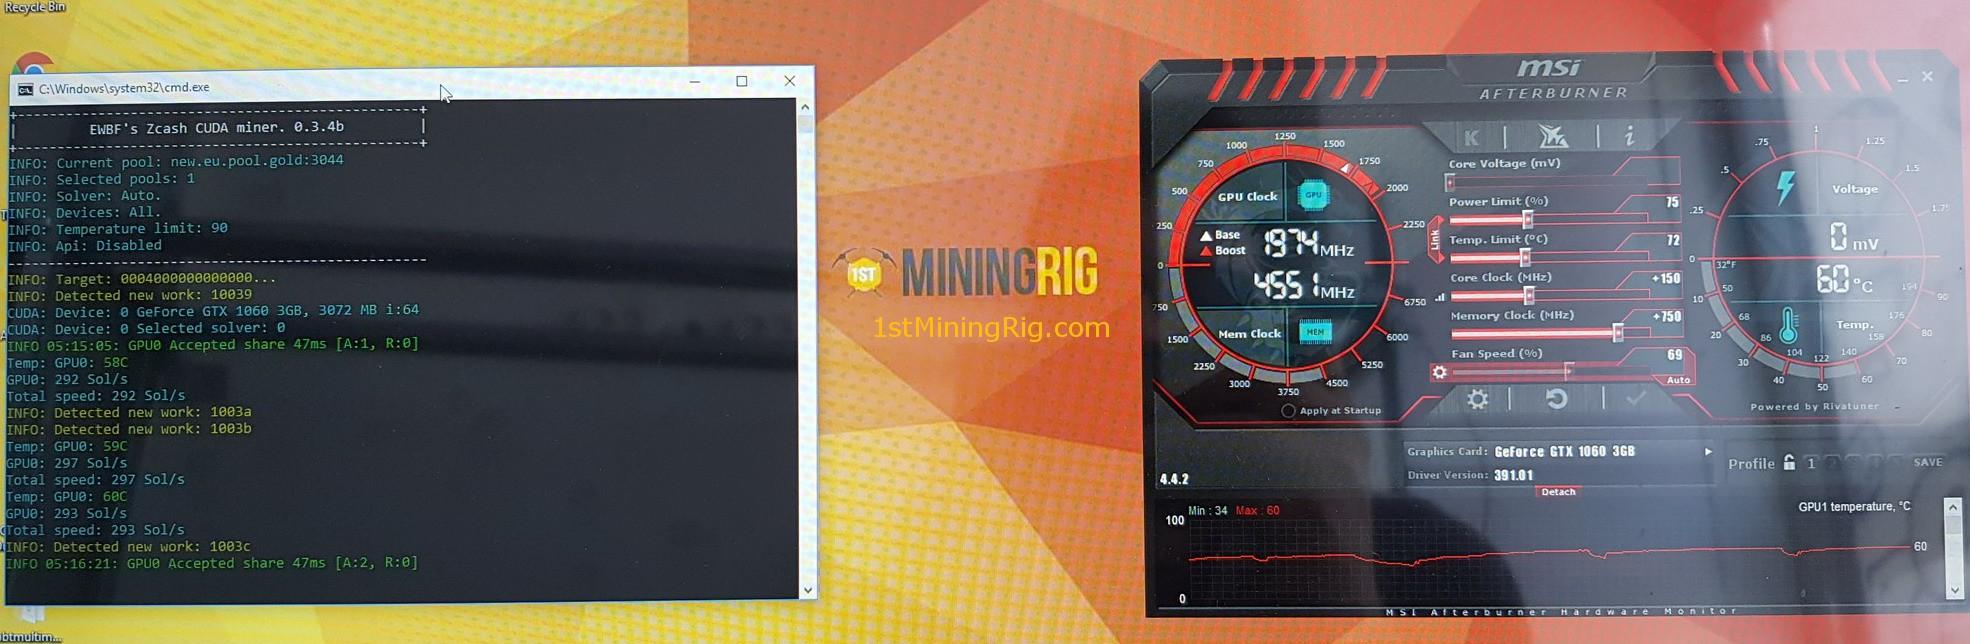 MSI GTX 1060 ARMOR 3GB OC Mining Performance Review - 1st